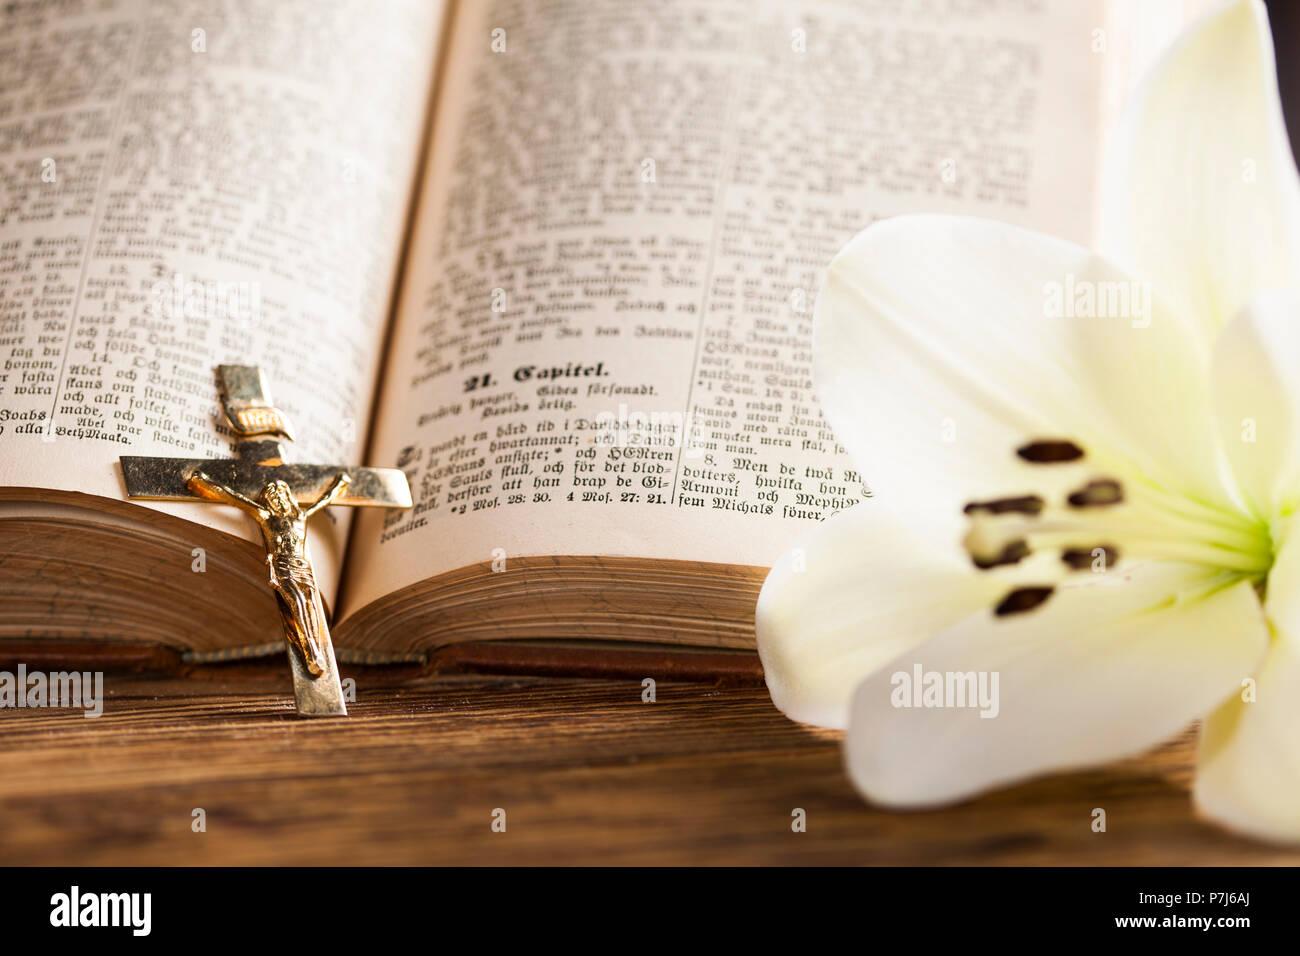 Ant Martina Franca sacrament of communion, eucharist symbol stock photo